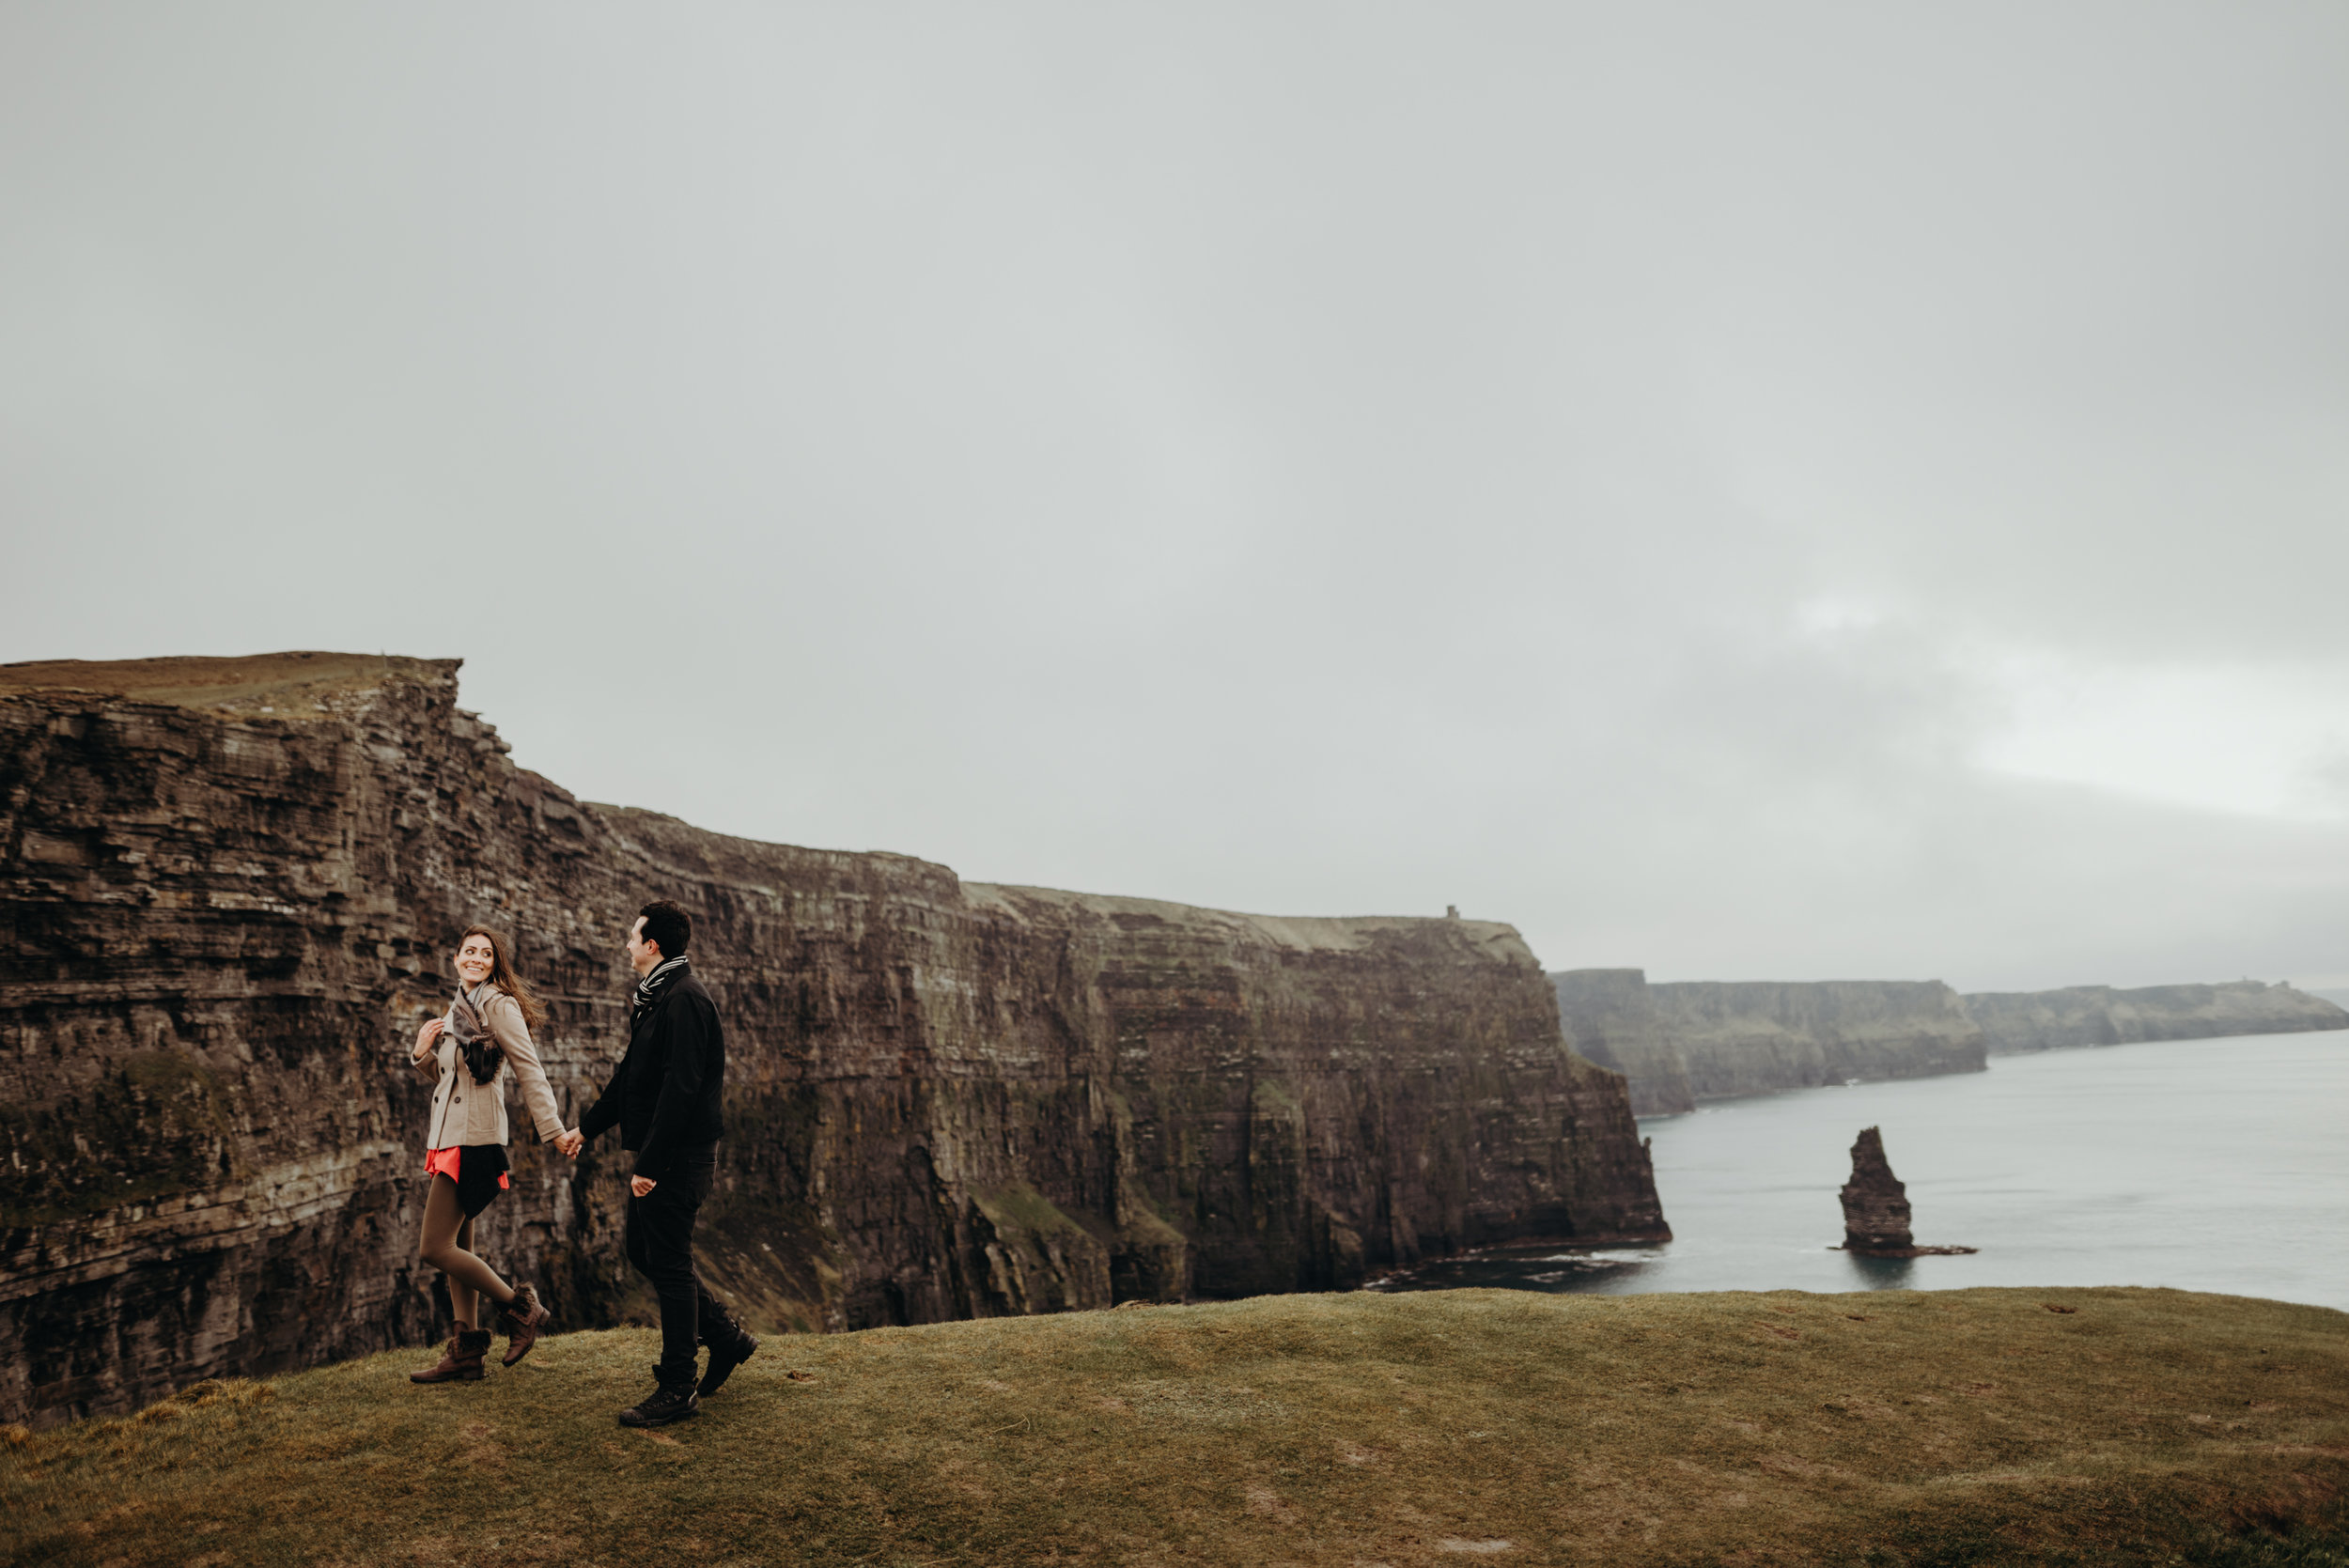 Cliffs Of Moher Engagement Session - Cliffs of Moher Proposal - Cliffs of Mhoer Elopement_5552-Edit-4.jpg